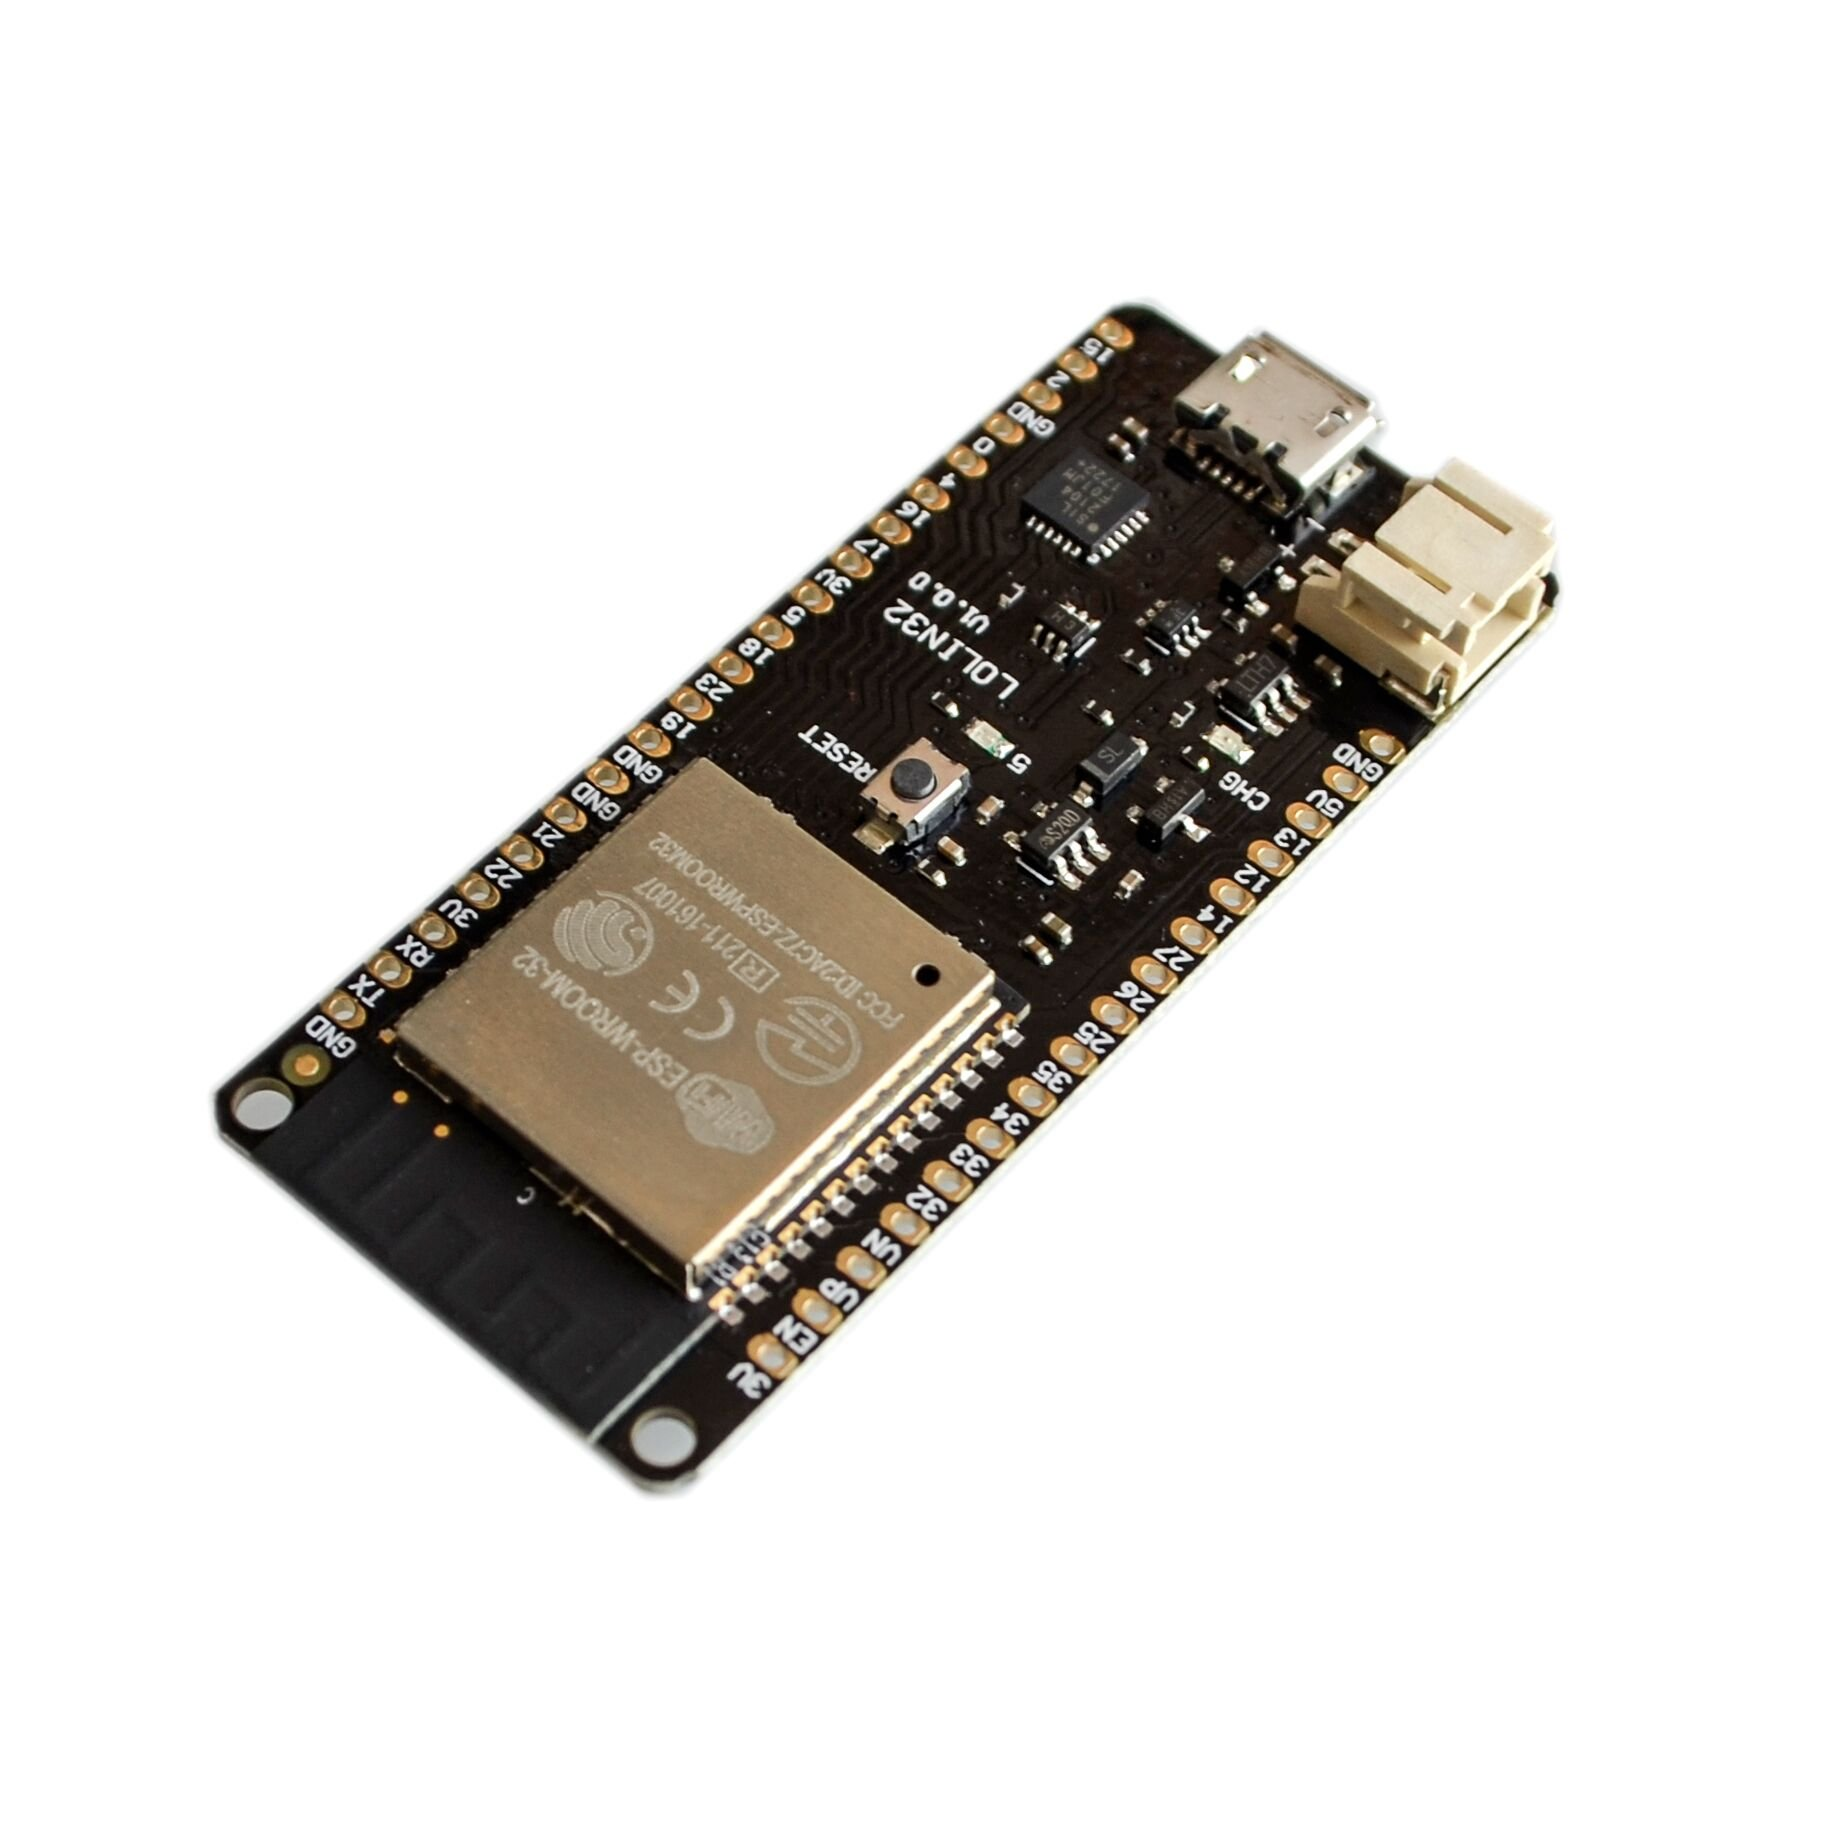 Seajunn 10PCS/LOT ESP32 ESP-32 ESP-32S ESP32S For WeMos Mini D1 LOLIN32 Wifi Bluetooth Wireless Board Module Based ESP-WROOM-32 Dual